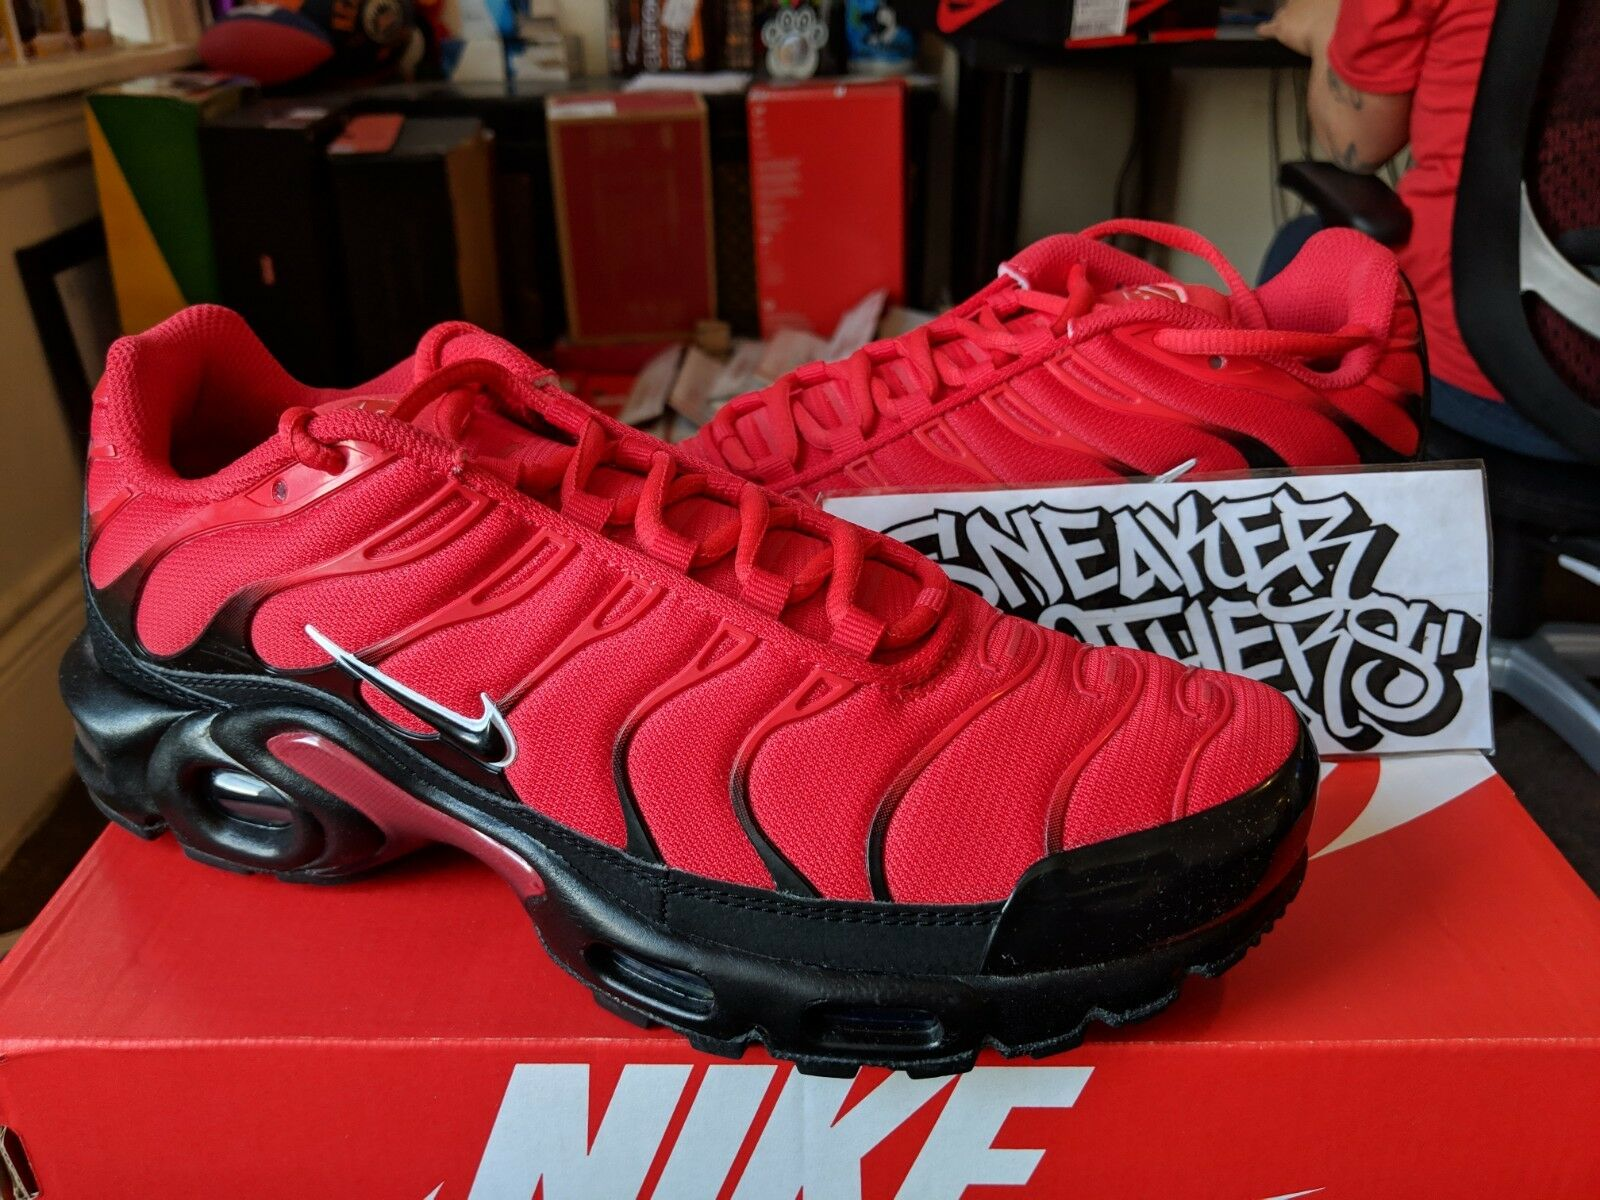 Air Red 852630 Size White Bred 603 Plus Tn 12 Black University Tuned Nike Max 1 LpGqVzjSUM